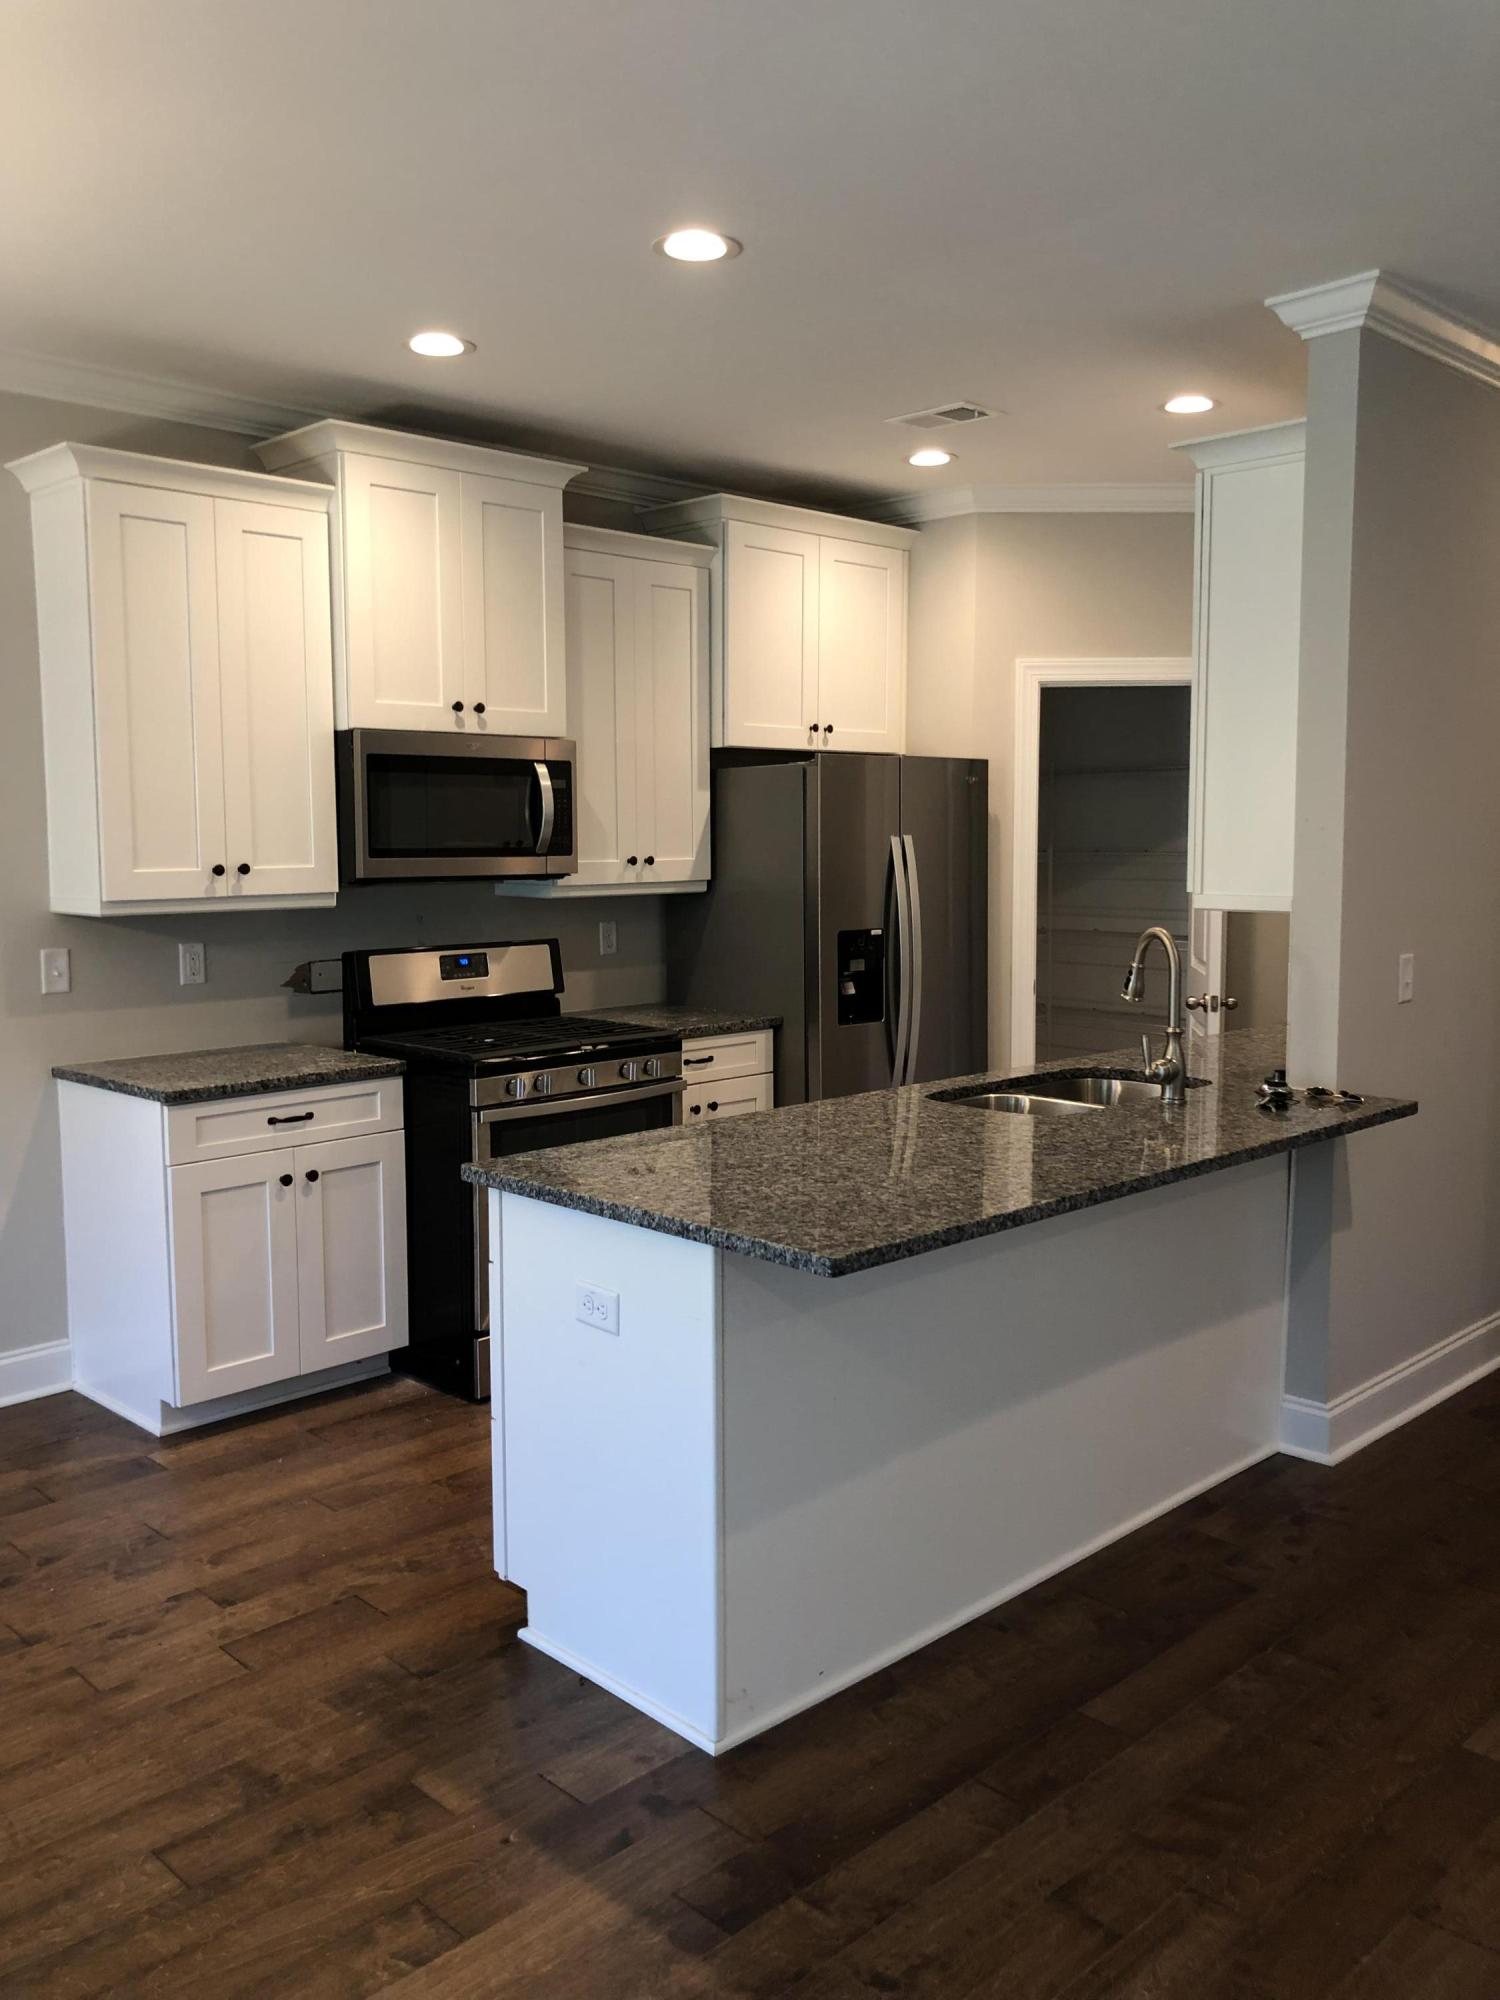 Fenwick Commons Homes For Sale - 1101 Santa Elena, Johns Island, SC - 6